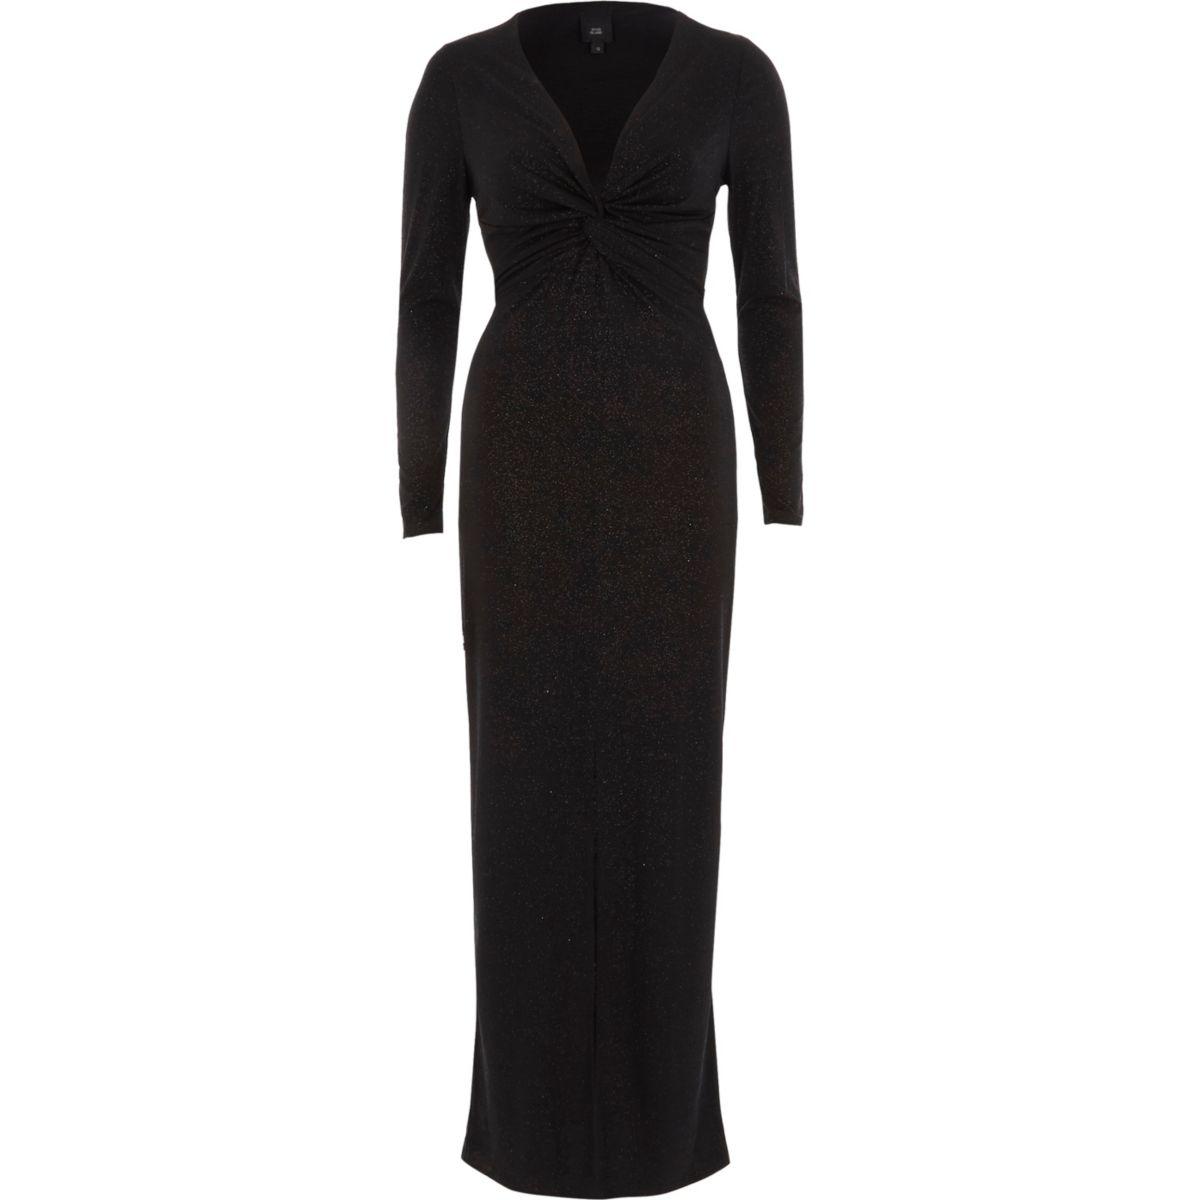 Black glitter knot front bodycon maxi dress